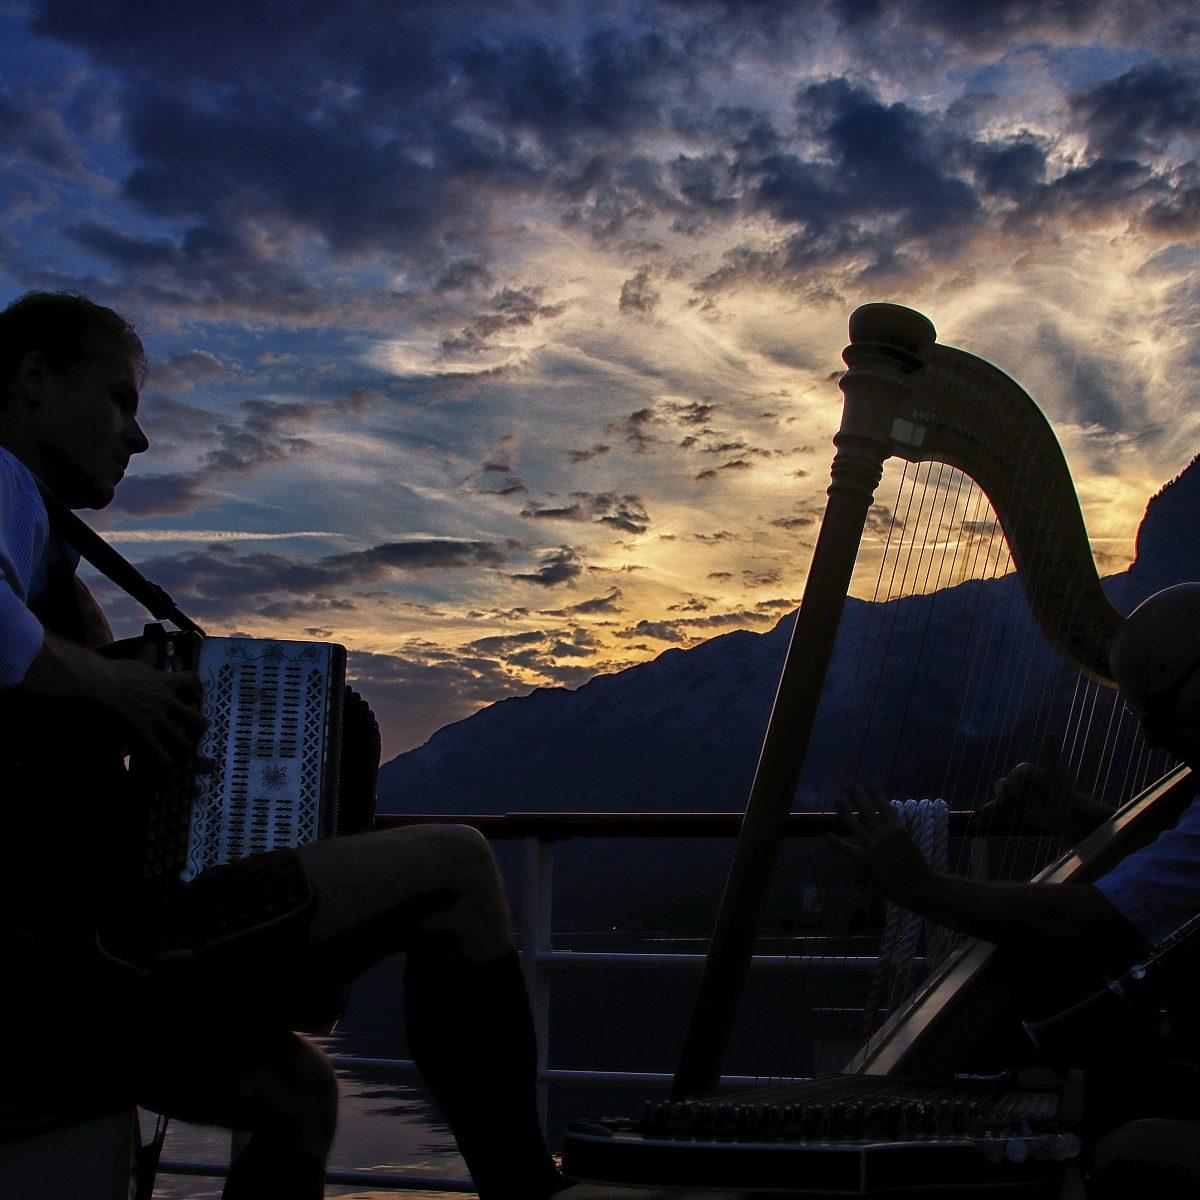 Musik an Bord